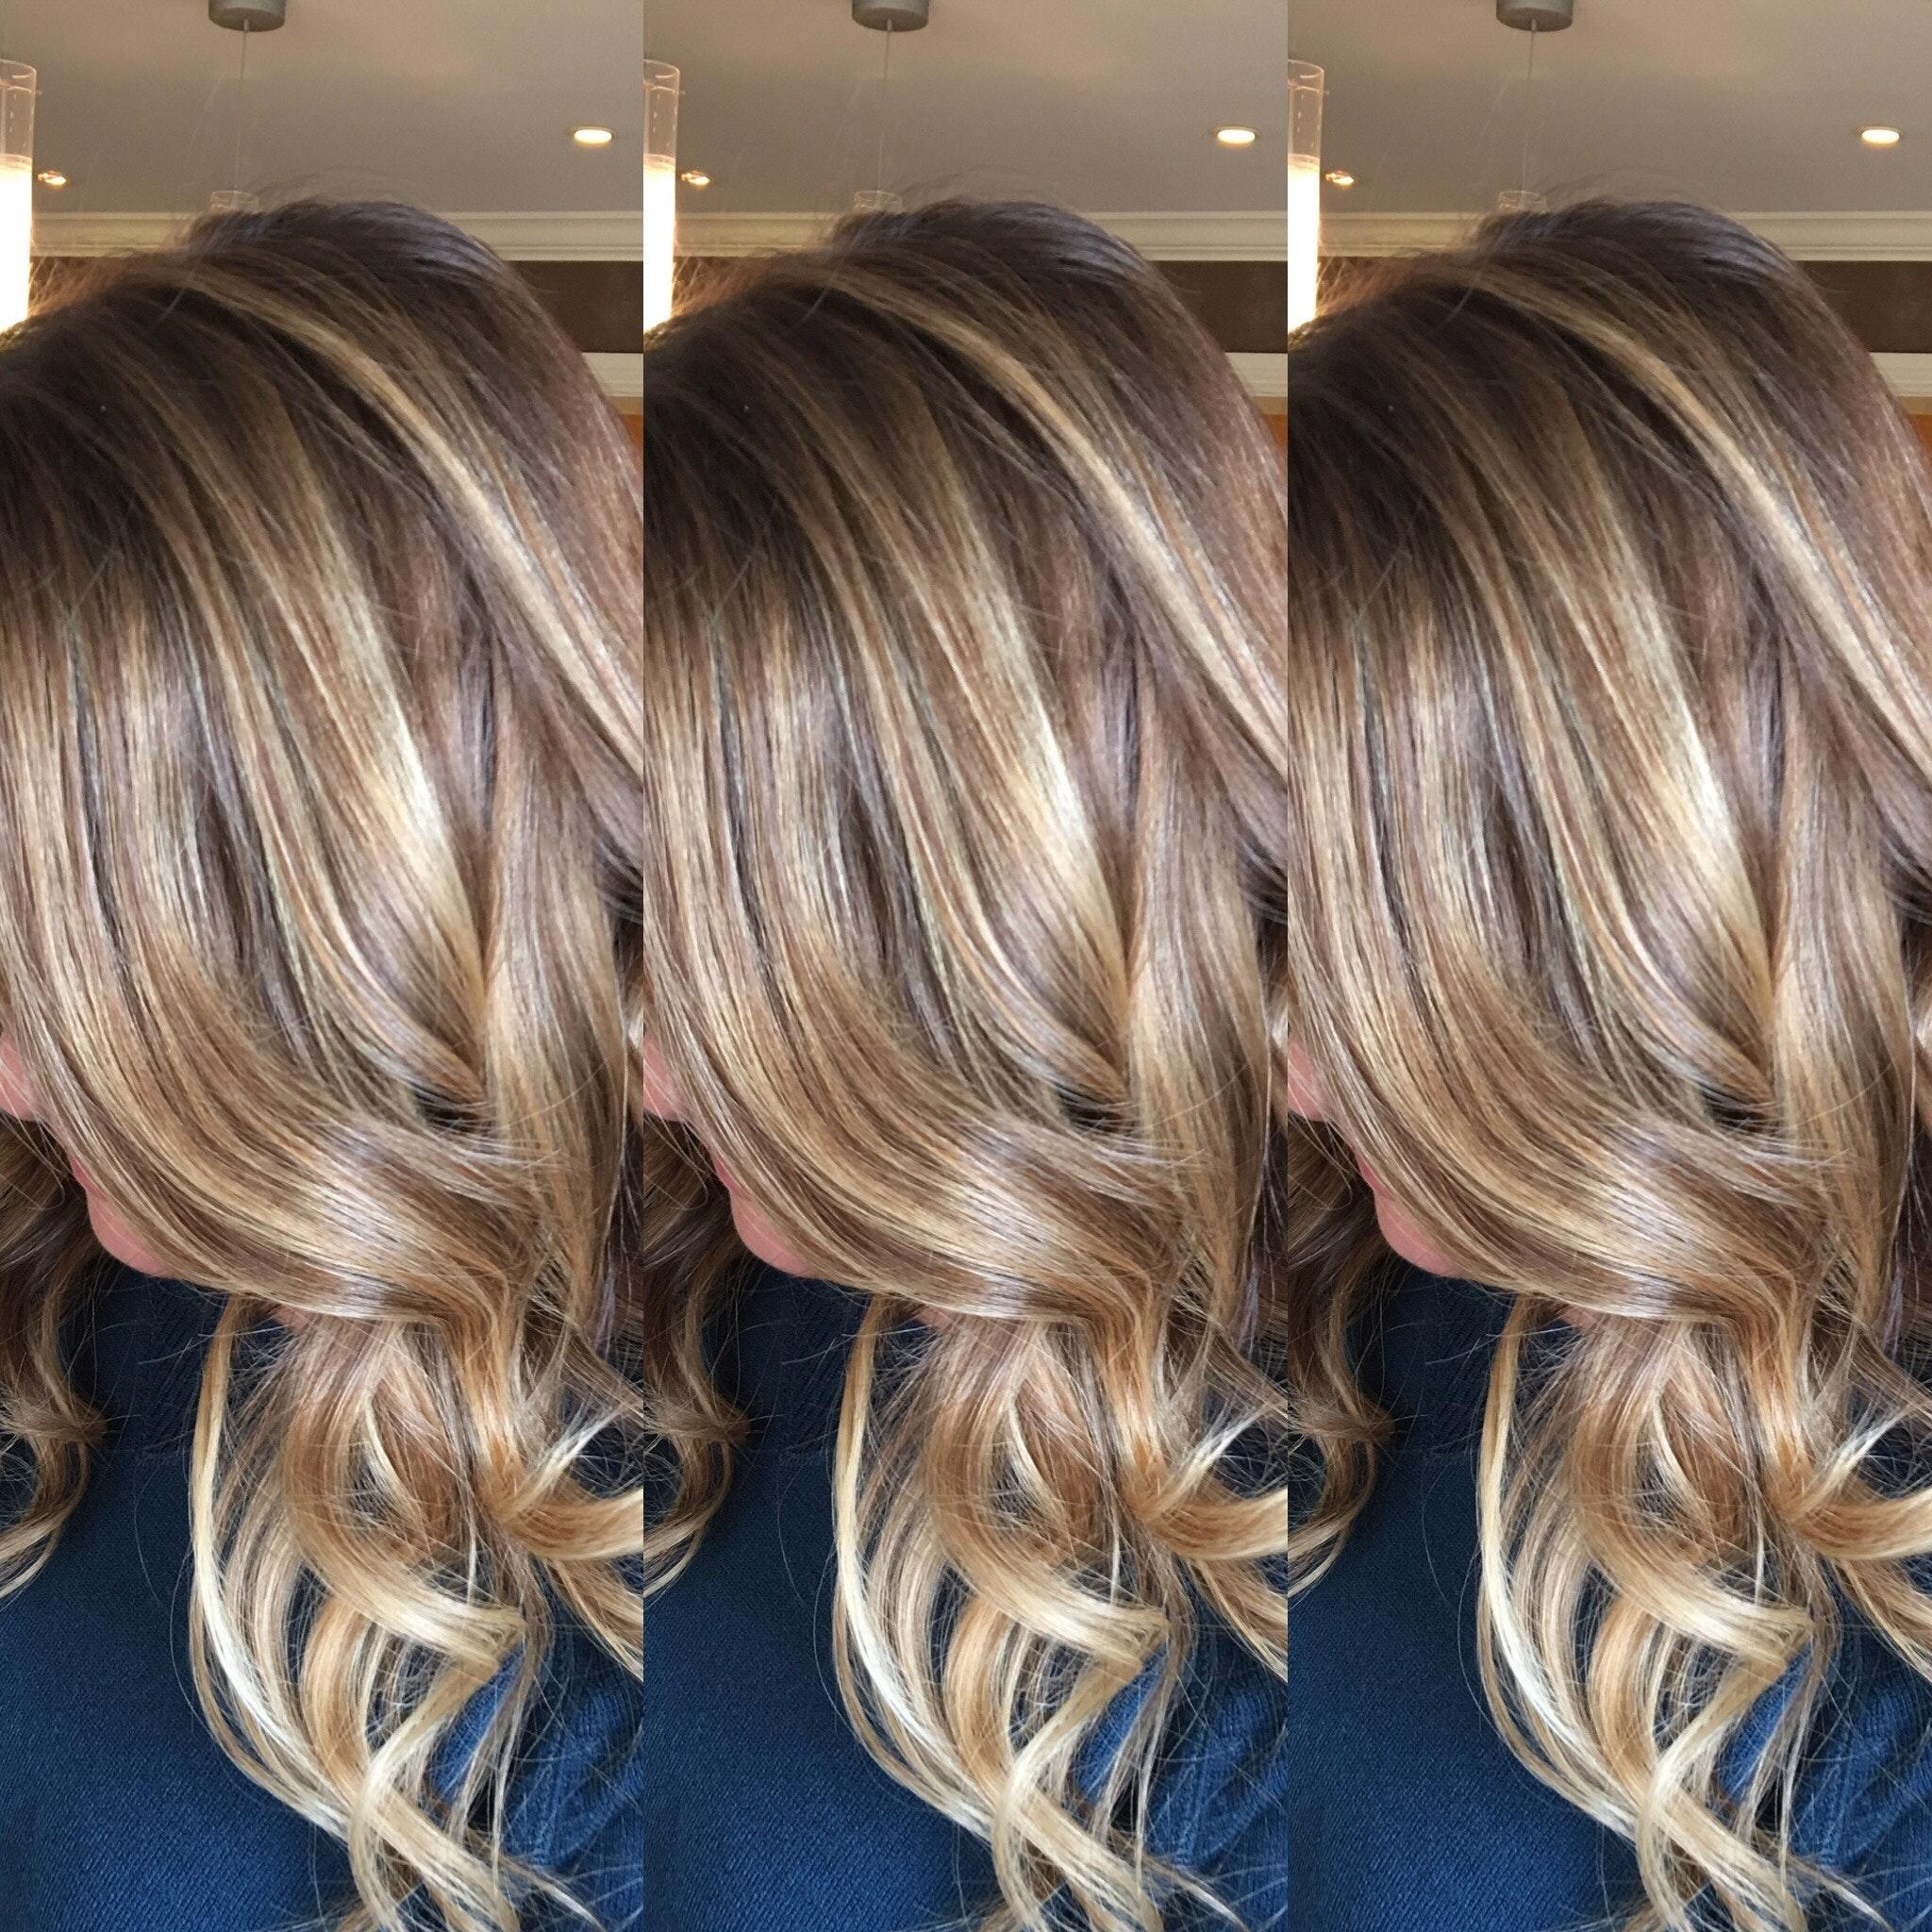 Melandre Salon Natural Light Brown Hair Balayage With